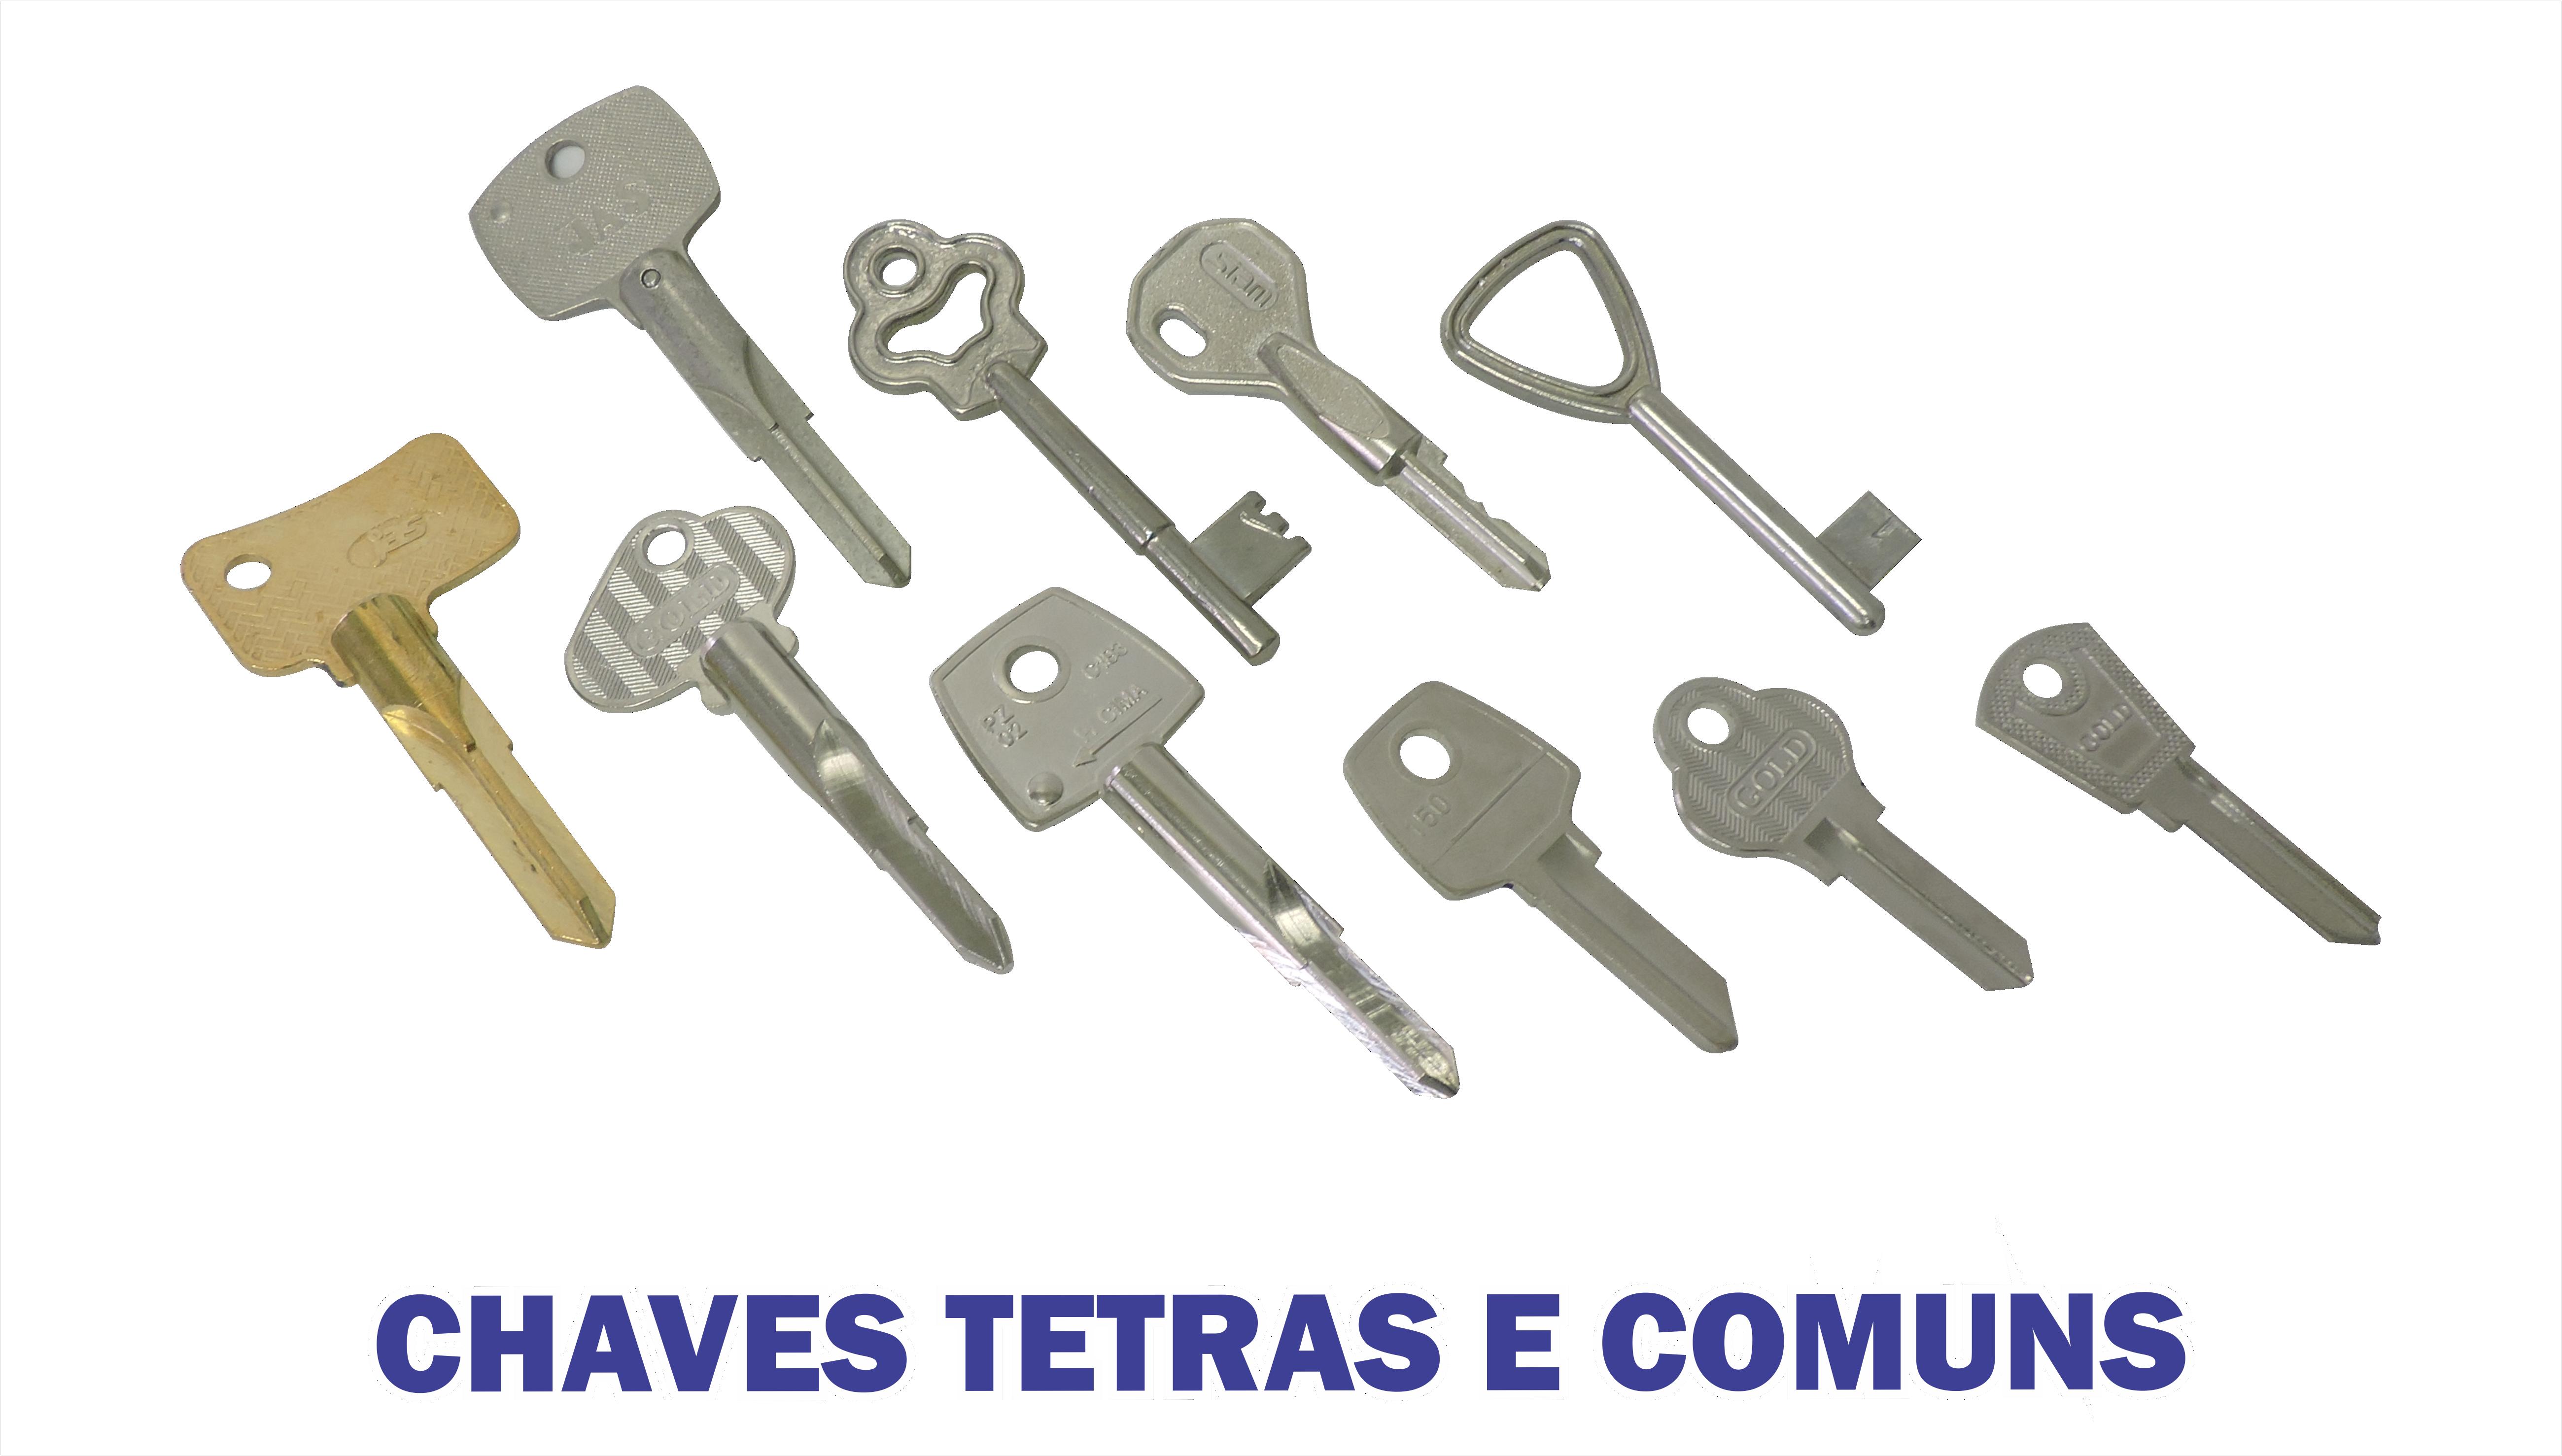 CHAVES TETRAS E COMUNS